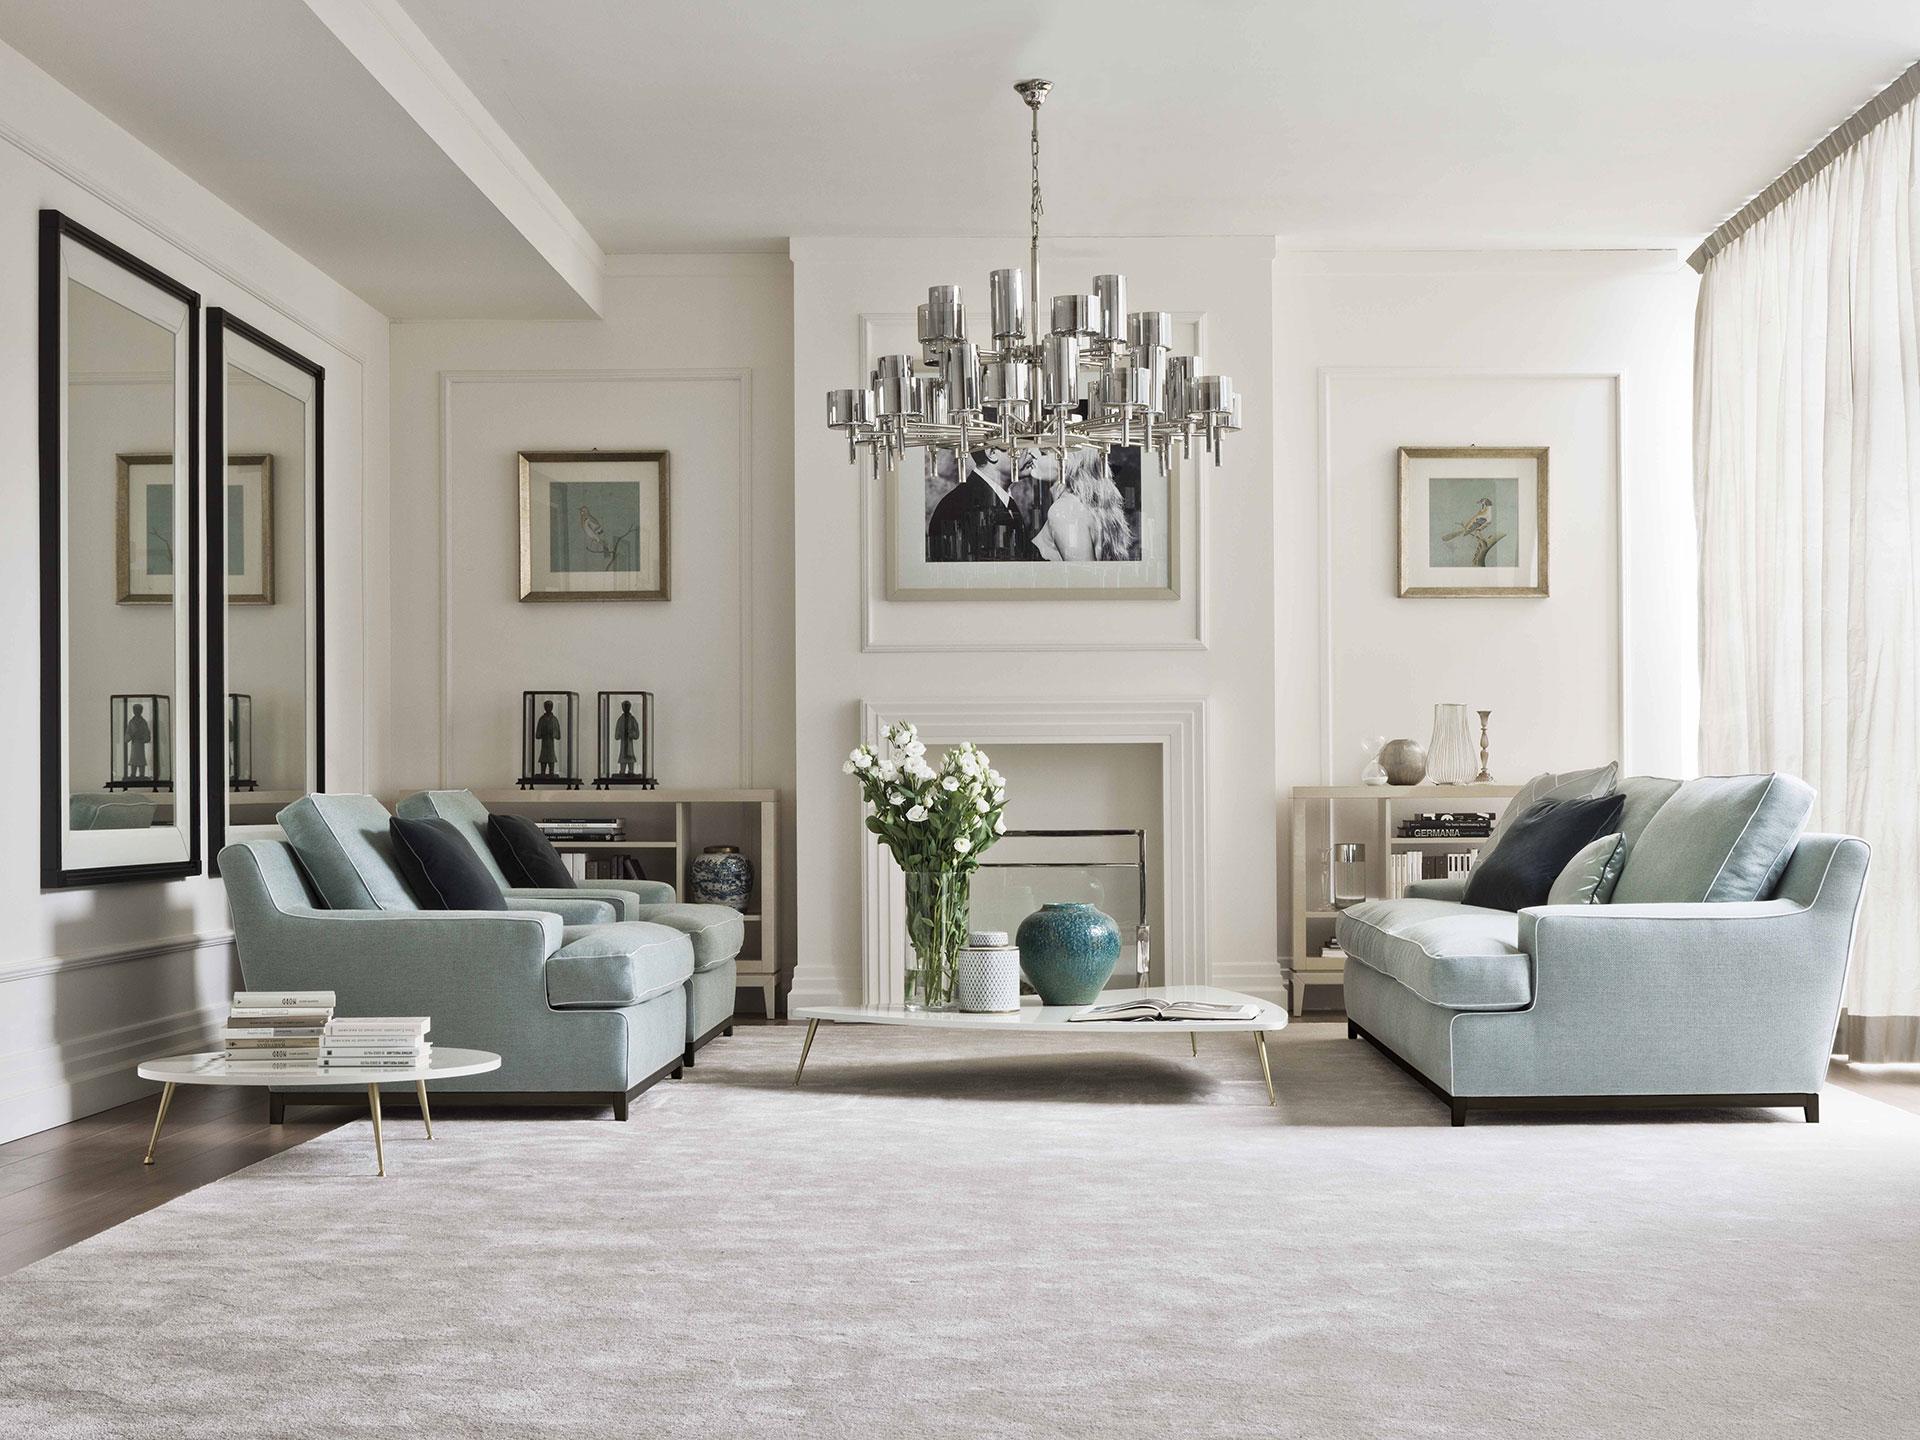 Passerini Luxury Furniture Online Store | Luxury ...